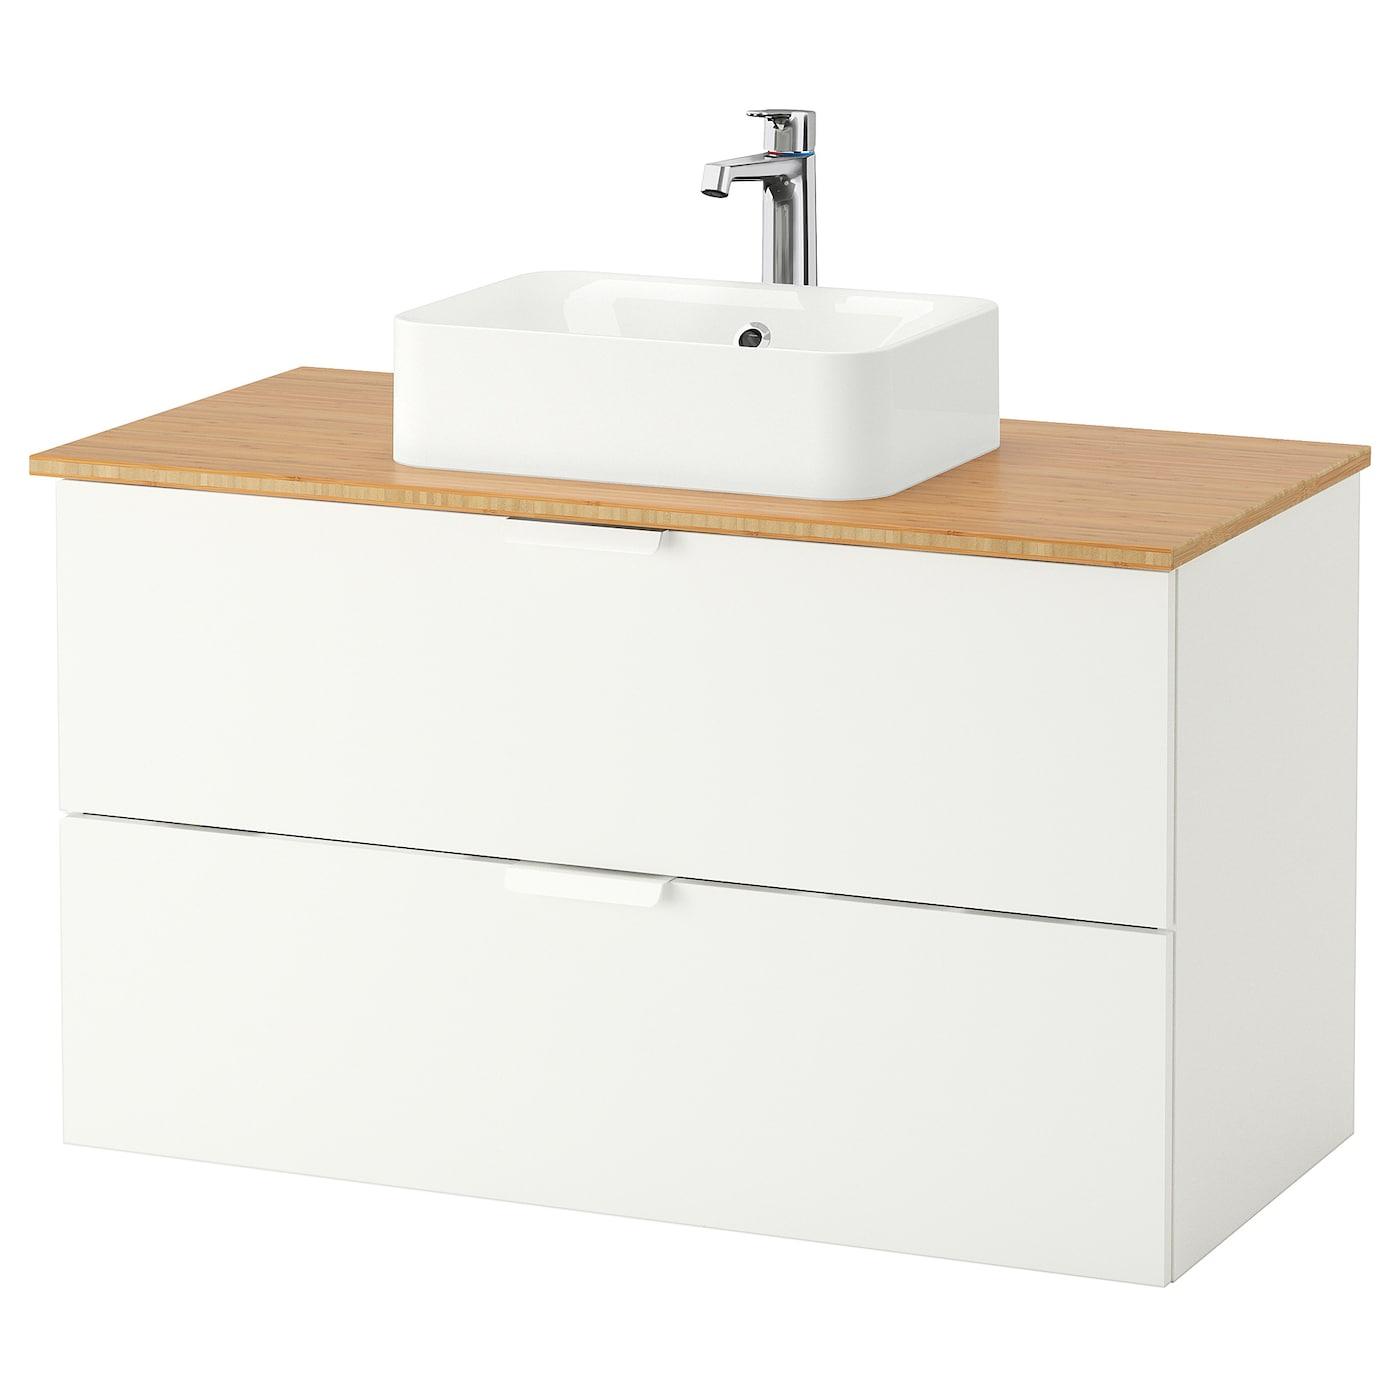 godmorgon ikea. Black Bedroom Furniture Sets. Home Design Ideas